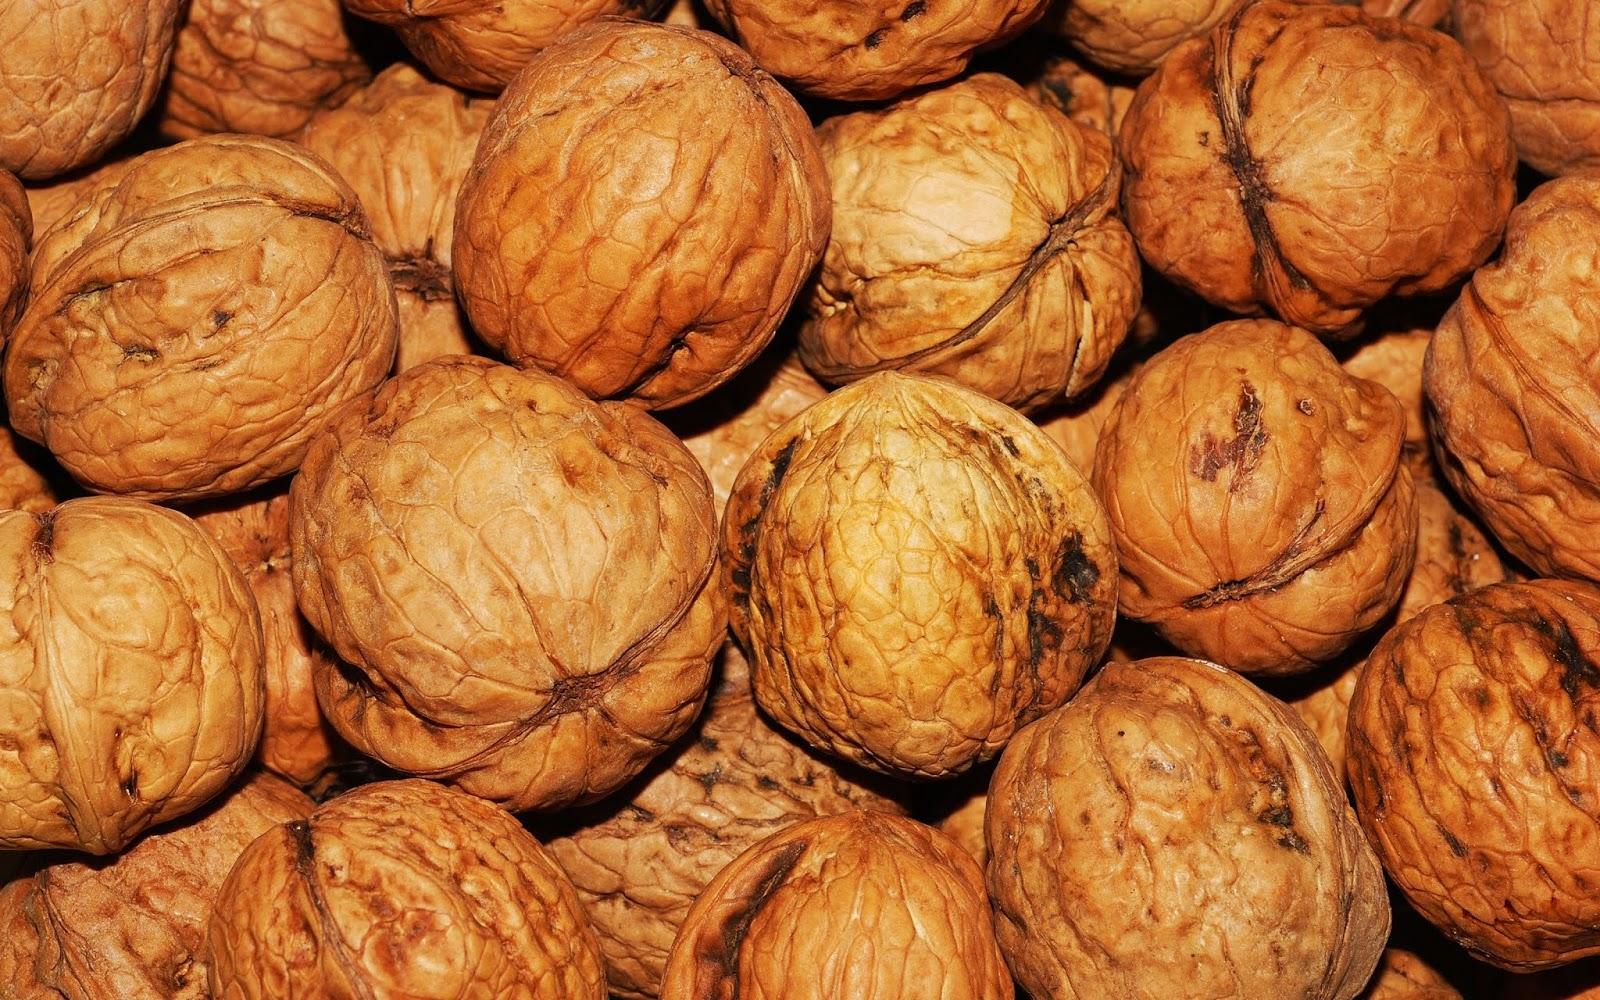 अखरोट के 10 सिद्ध लाभ | 10 Proven Benefits Of Walnuts in Hindi